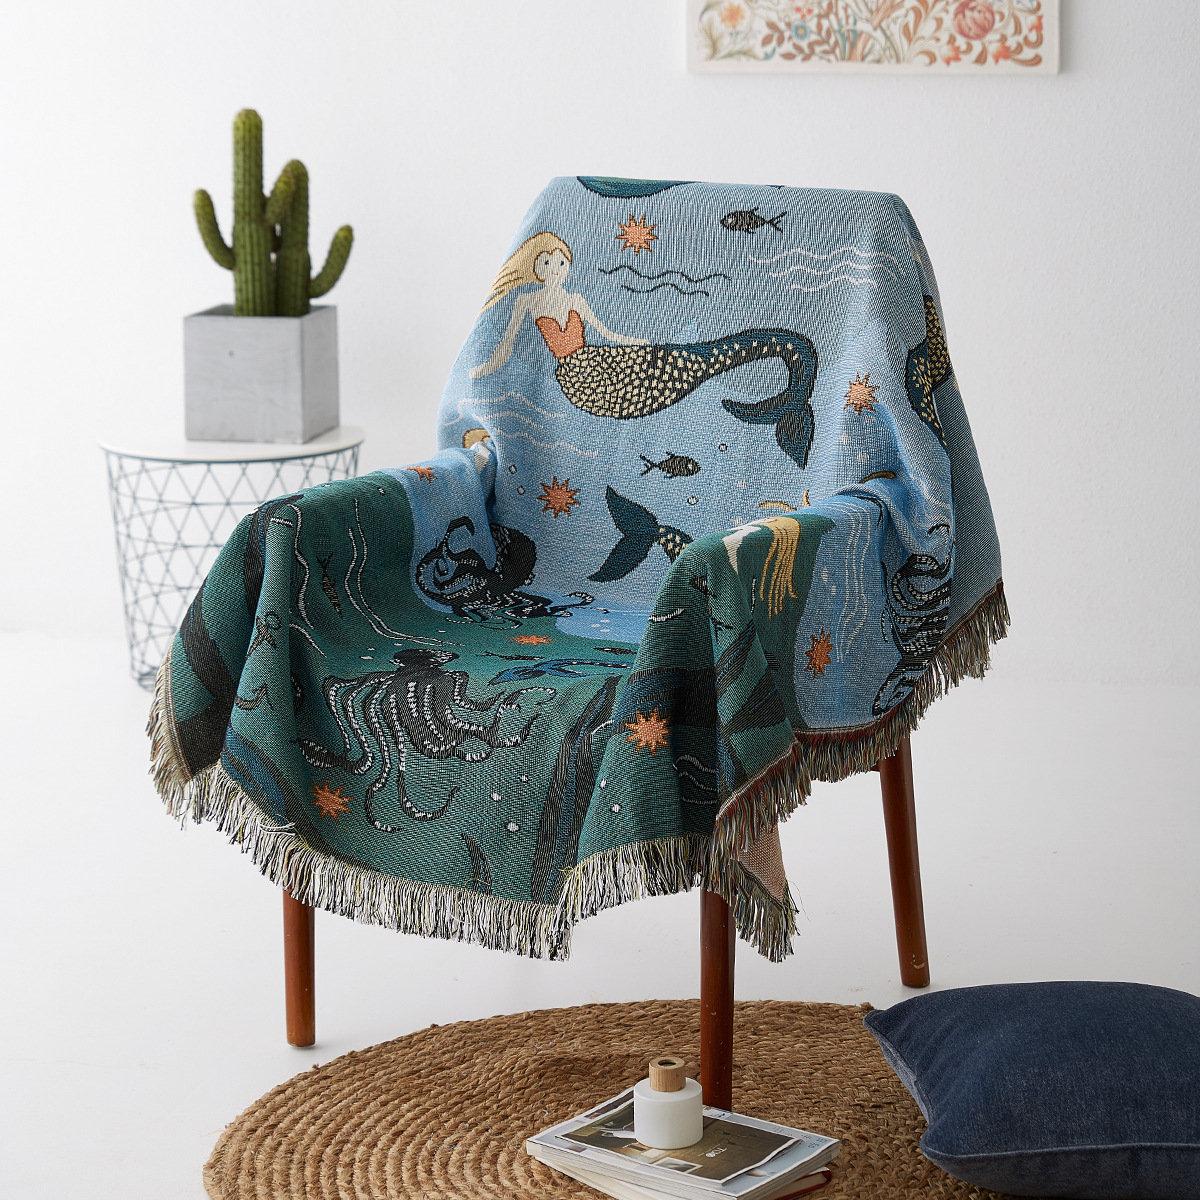 Original Design Blue Mermaid Printed Cotton Blend Sofa Cover Anti-dust Cover Home Tapestry Art Decor